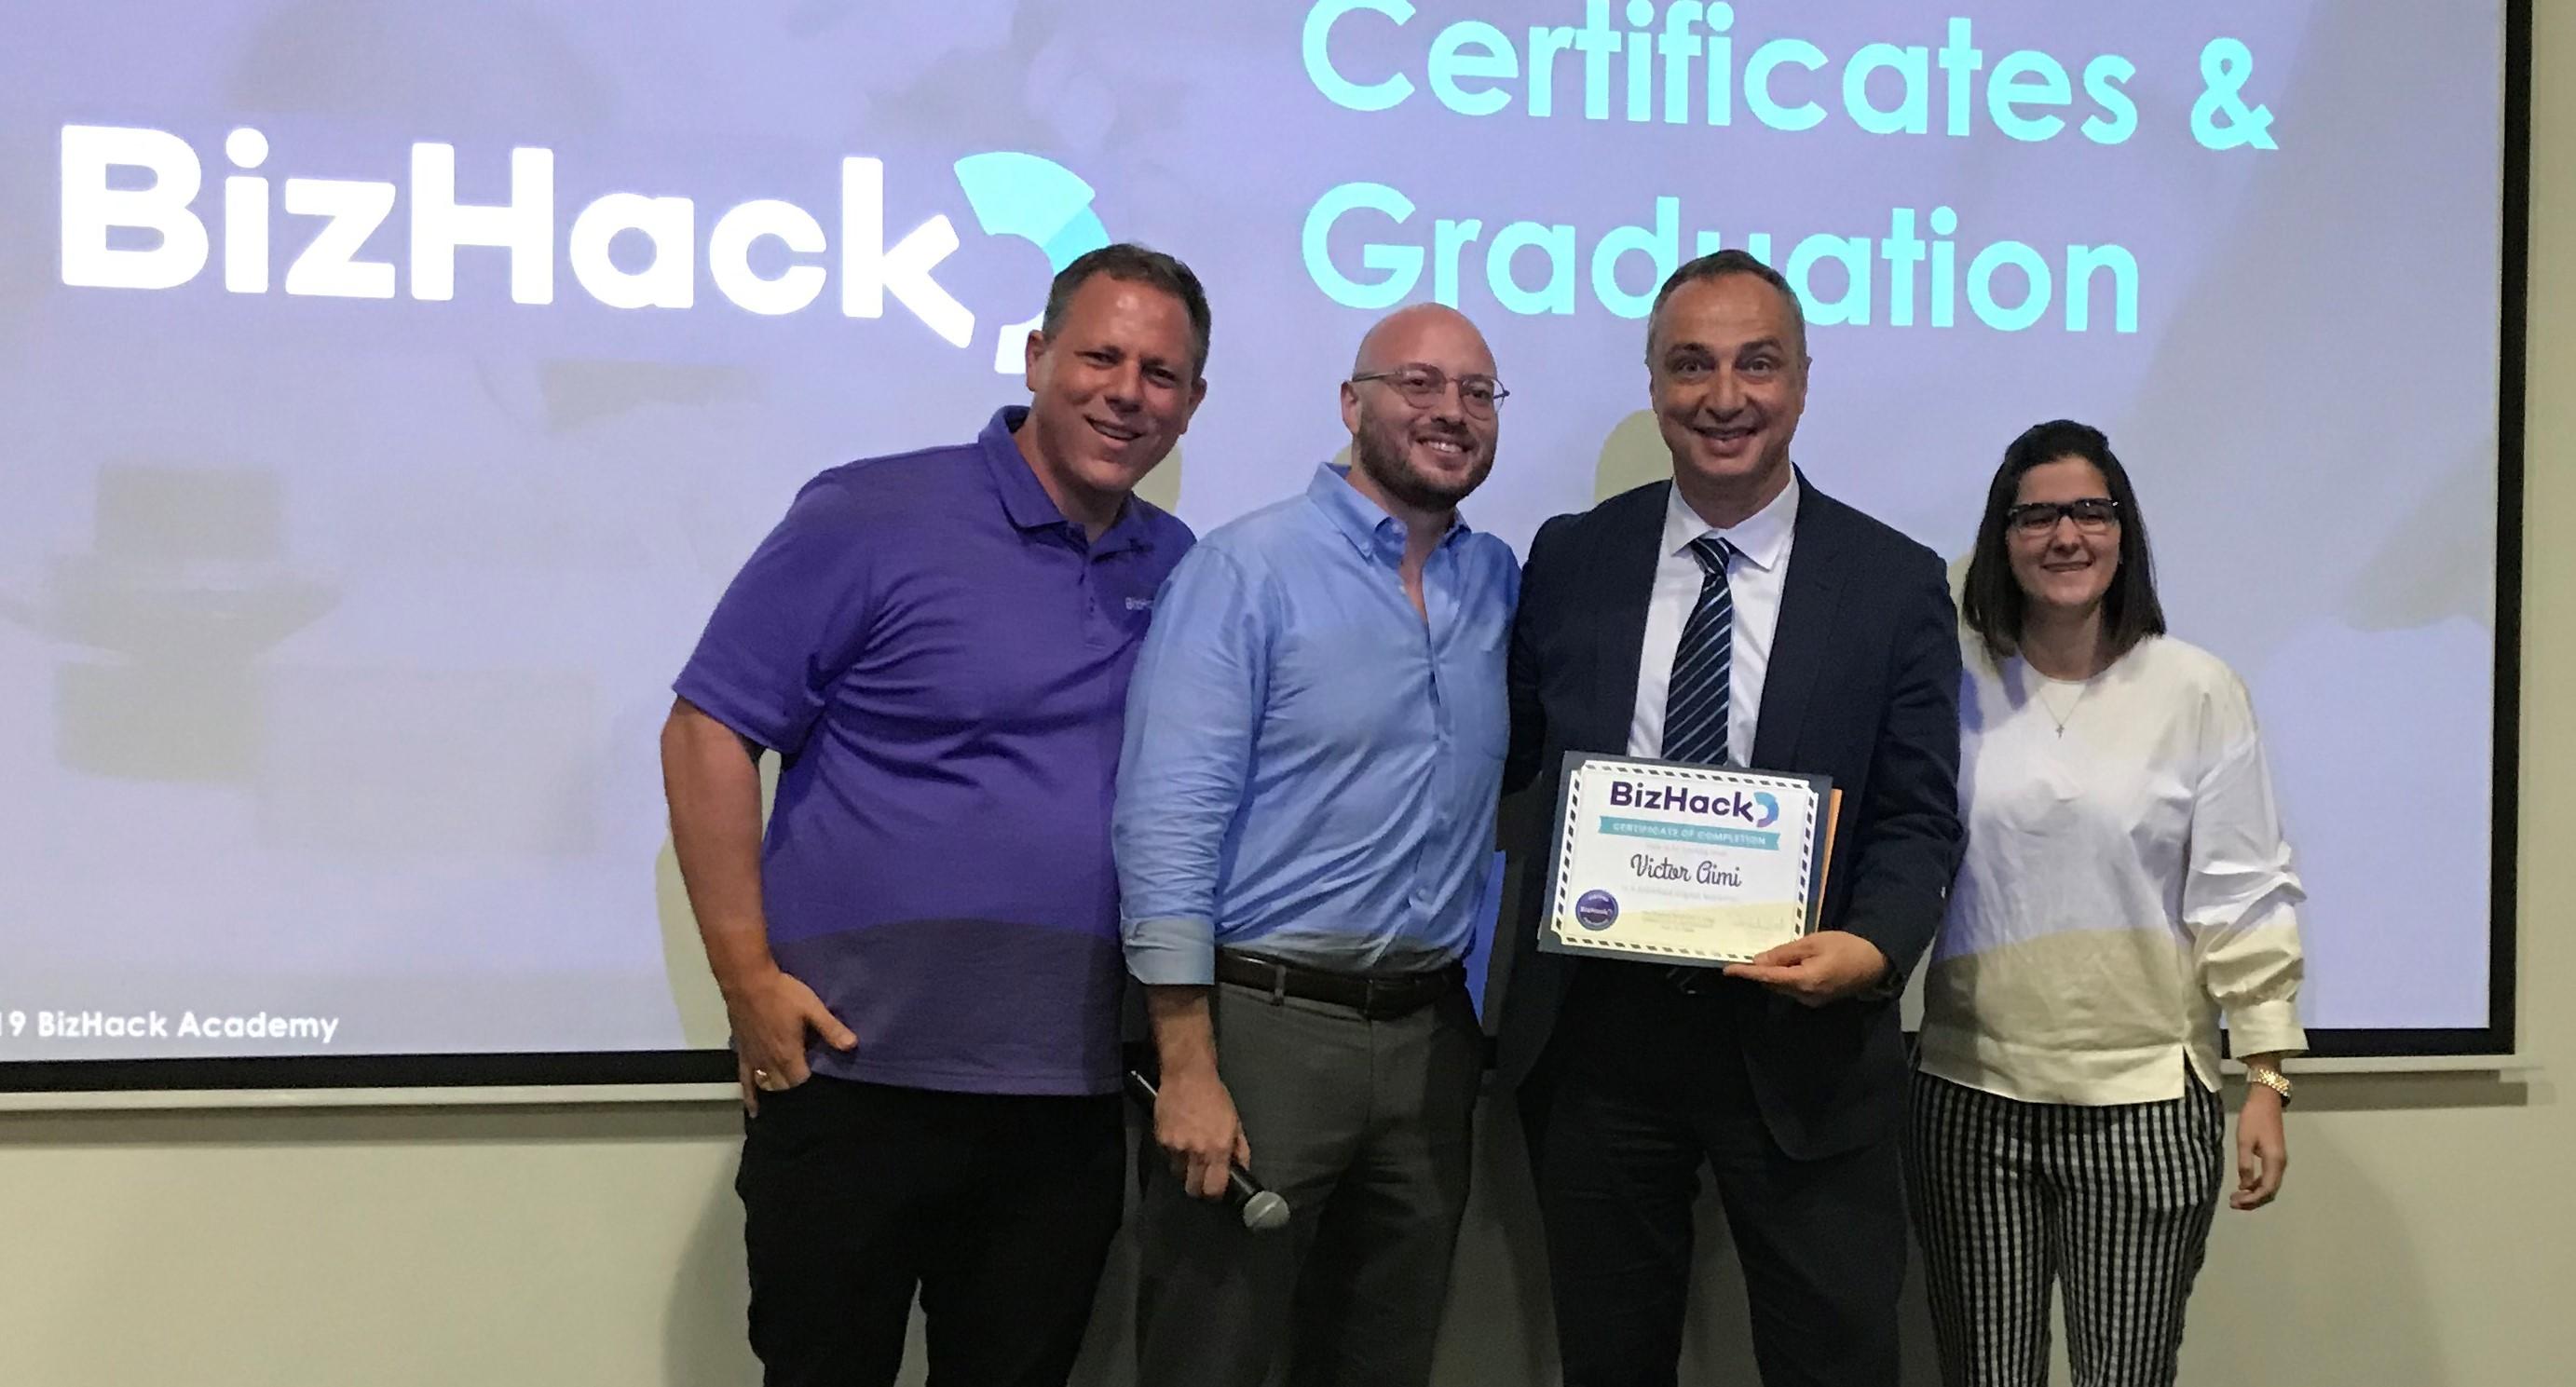 Dan Grech of BizHack at a class graduation in 2019